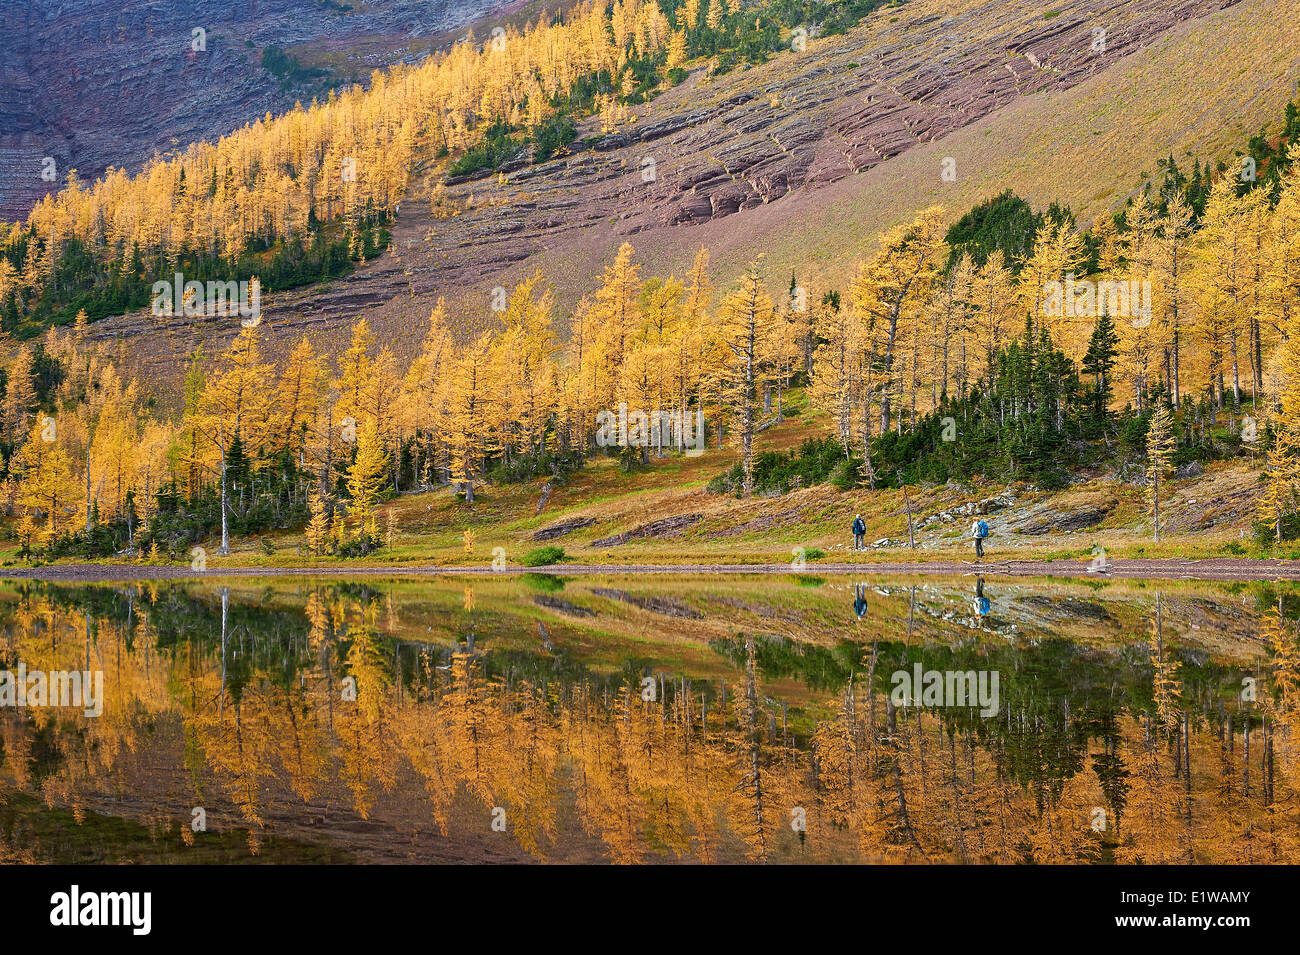 Fallen Farbe Reflexion, gelbe Bäume nennt man Tamarack oder Lärche (Larix Laricina), Upper Lake Rowe, Stockbild